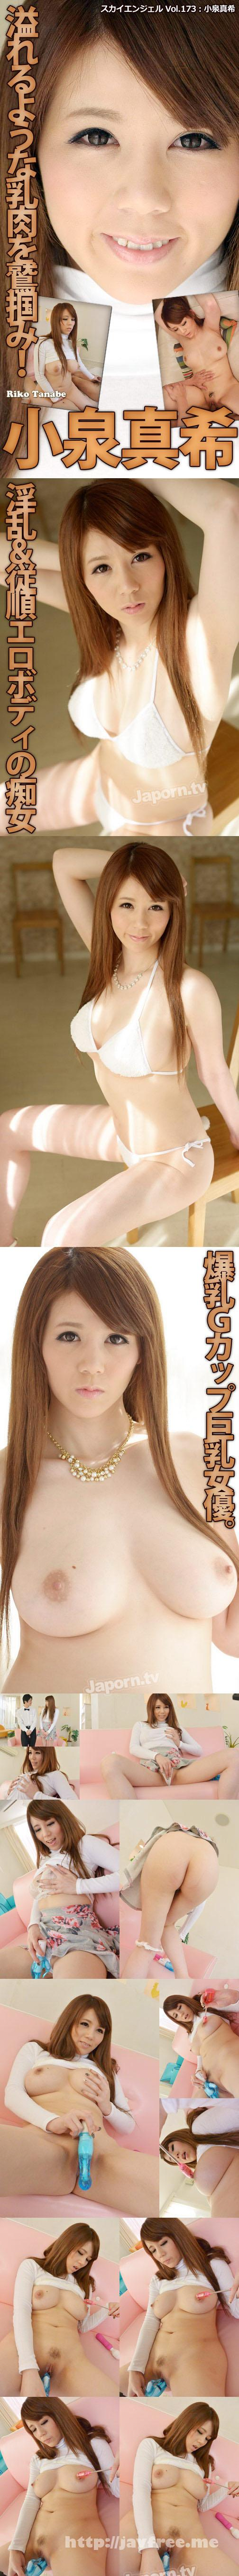 [SKY 290] スカイエンジェル Vol.173 : 小泉真希 小泉真希 Sky High Ent. Maki Koizumi